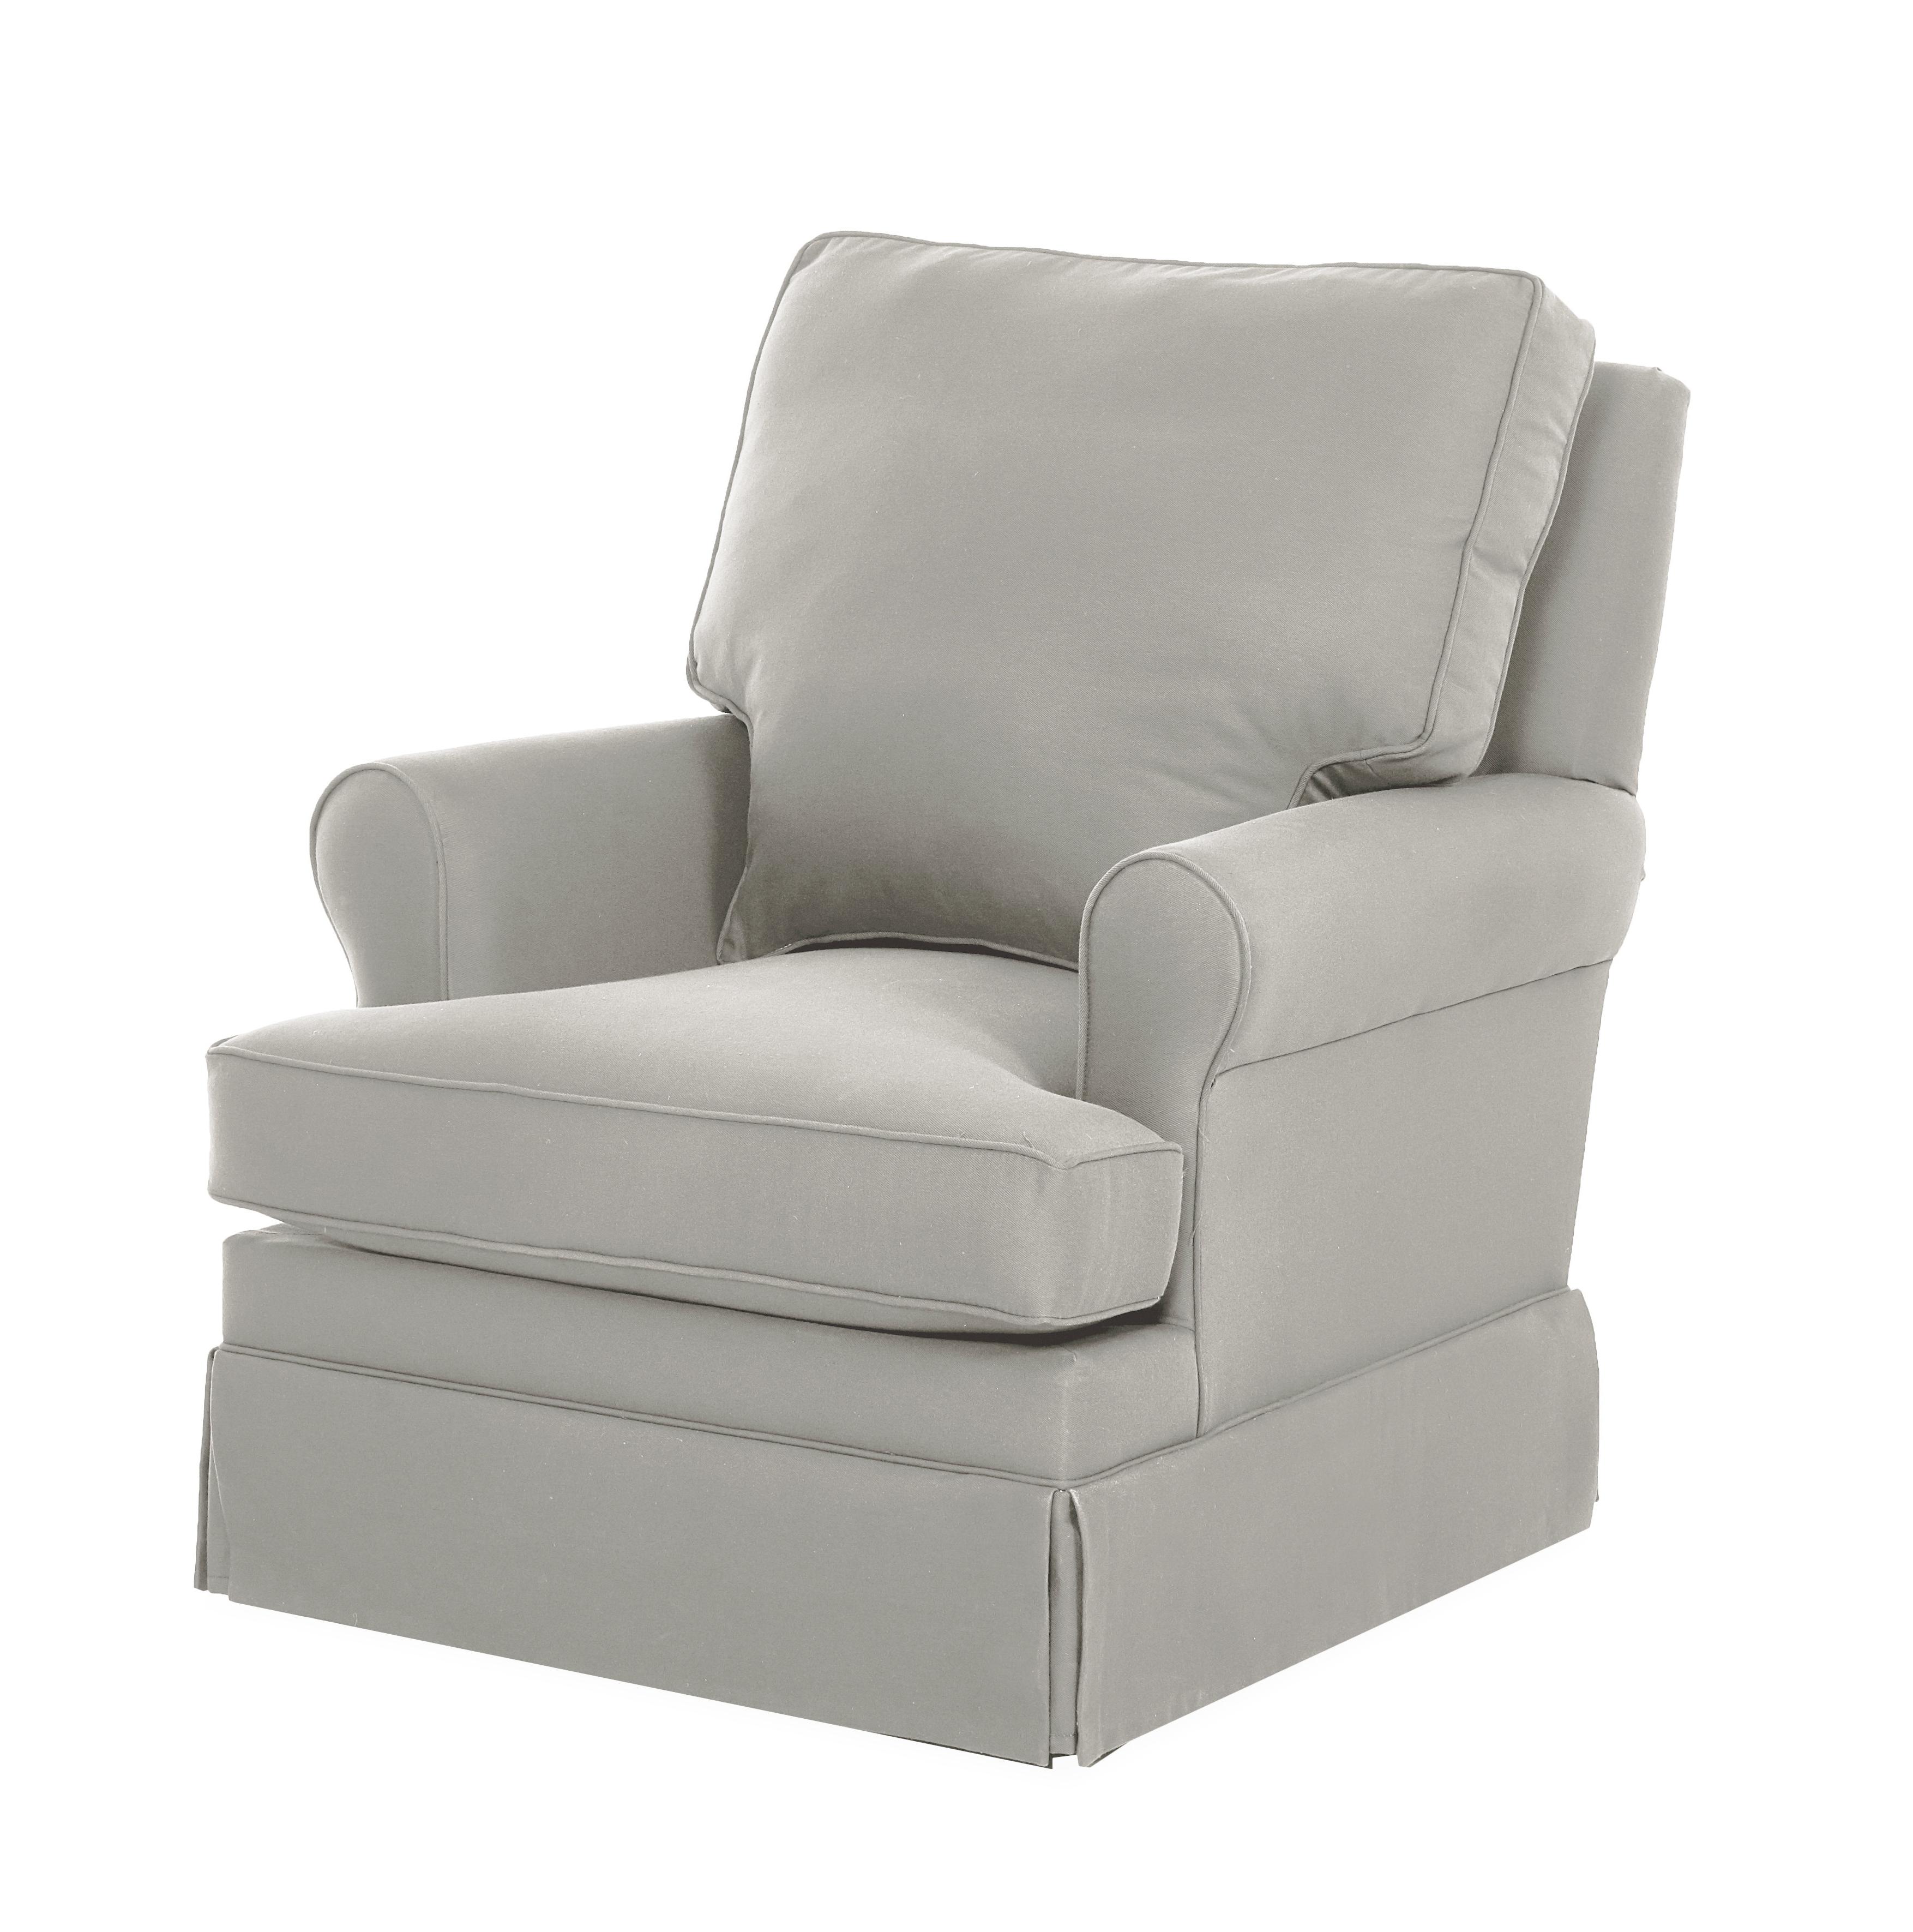 Wayfair Pertaining To Newest Katrina Grey Swivel Glider Chairs (View 17 of 20)